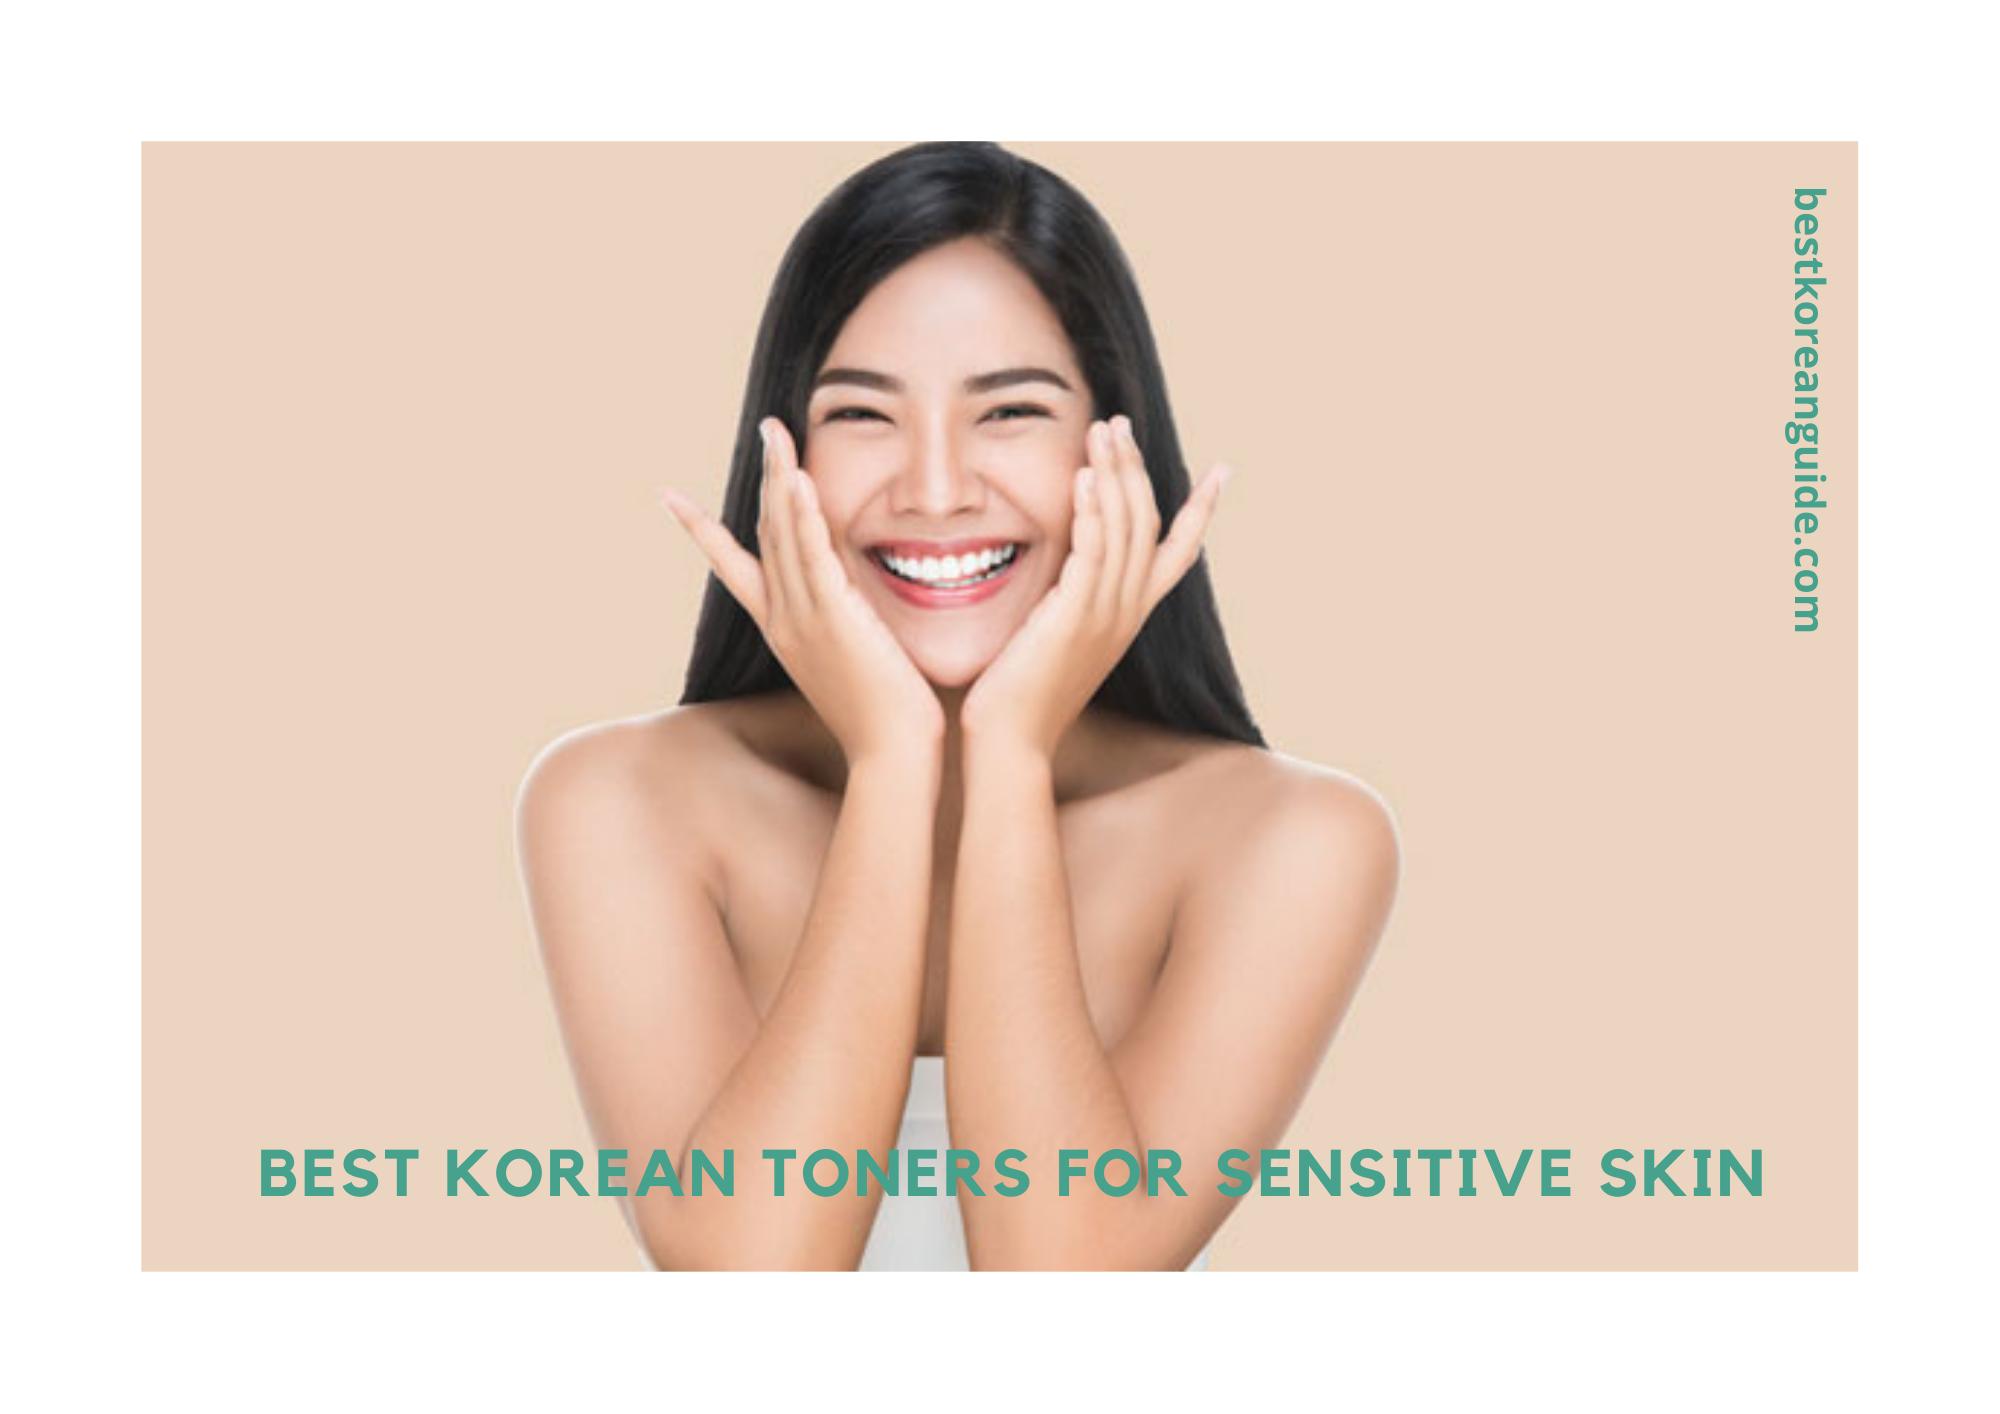 Best Korean Toners for sensitive skin